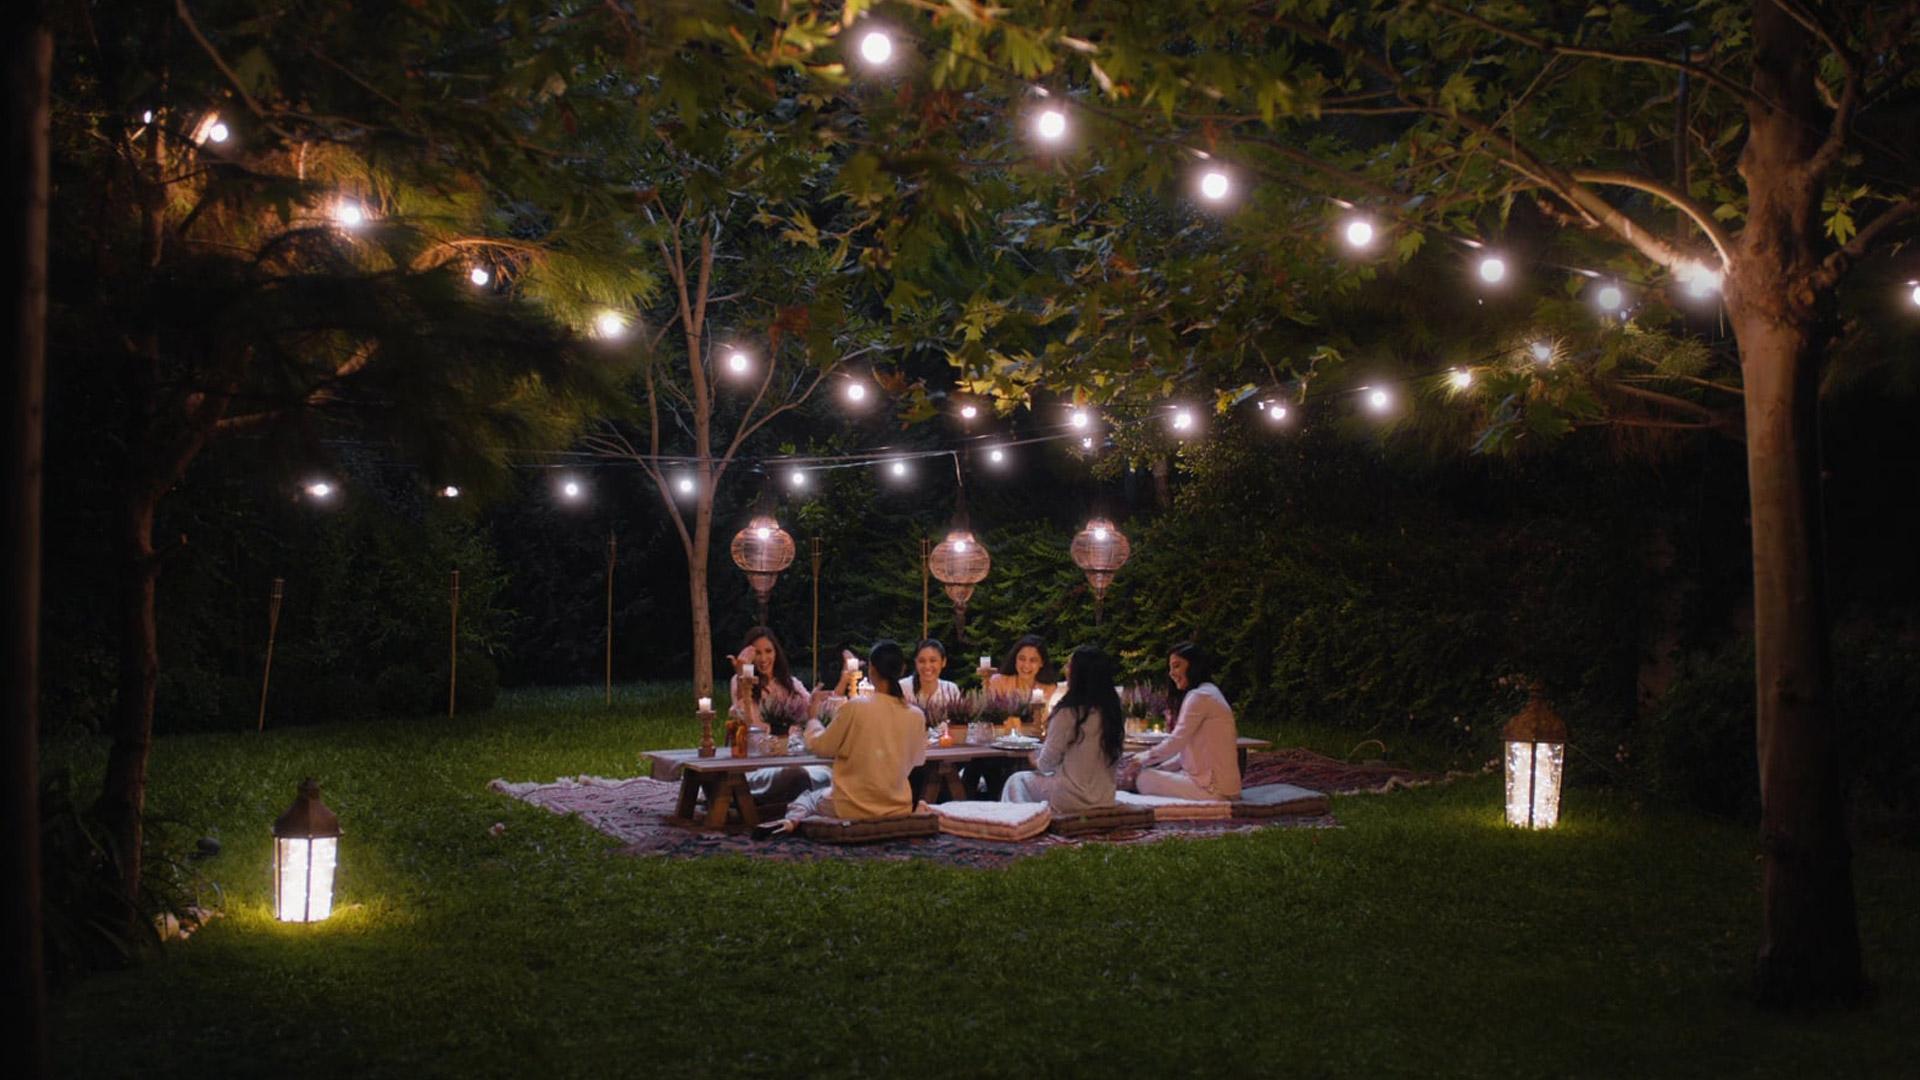 Dettol - Fairy Lights